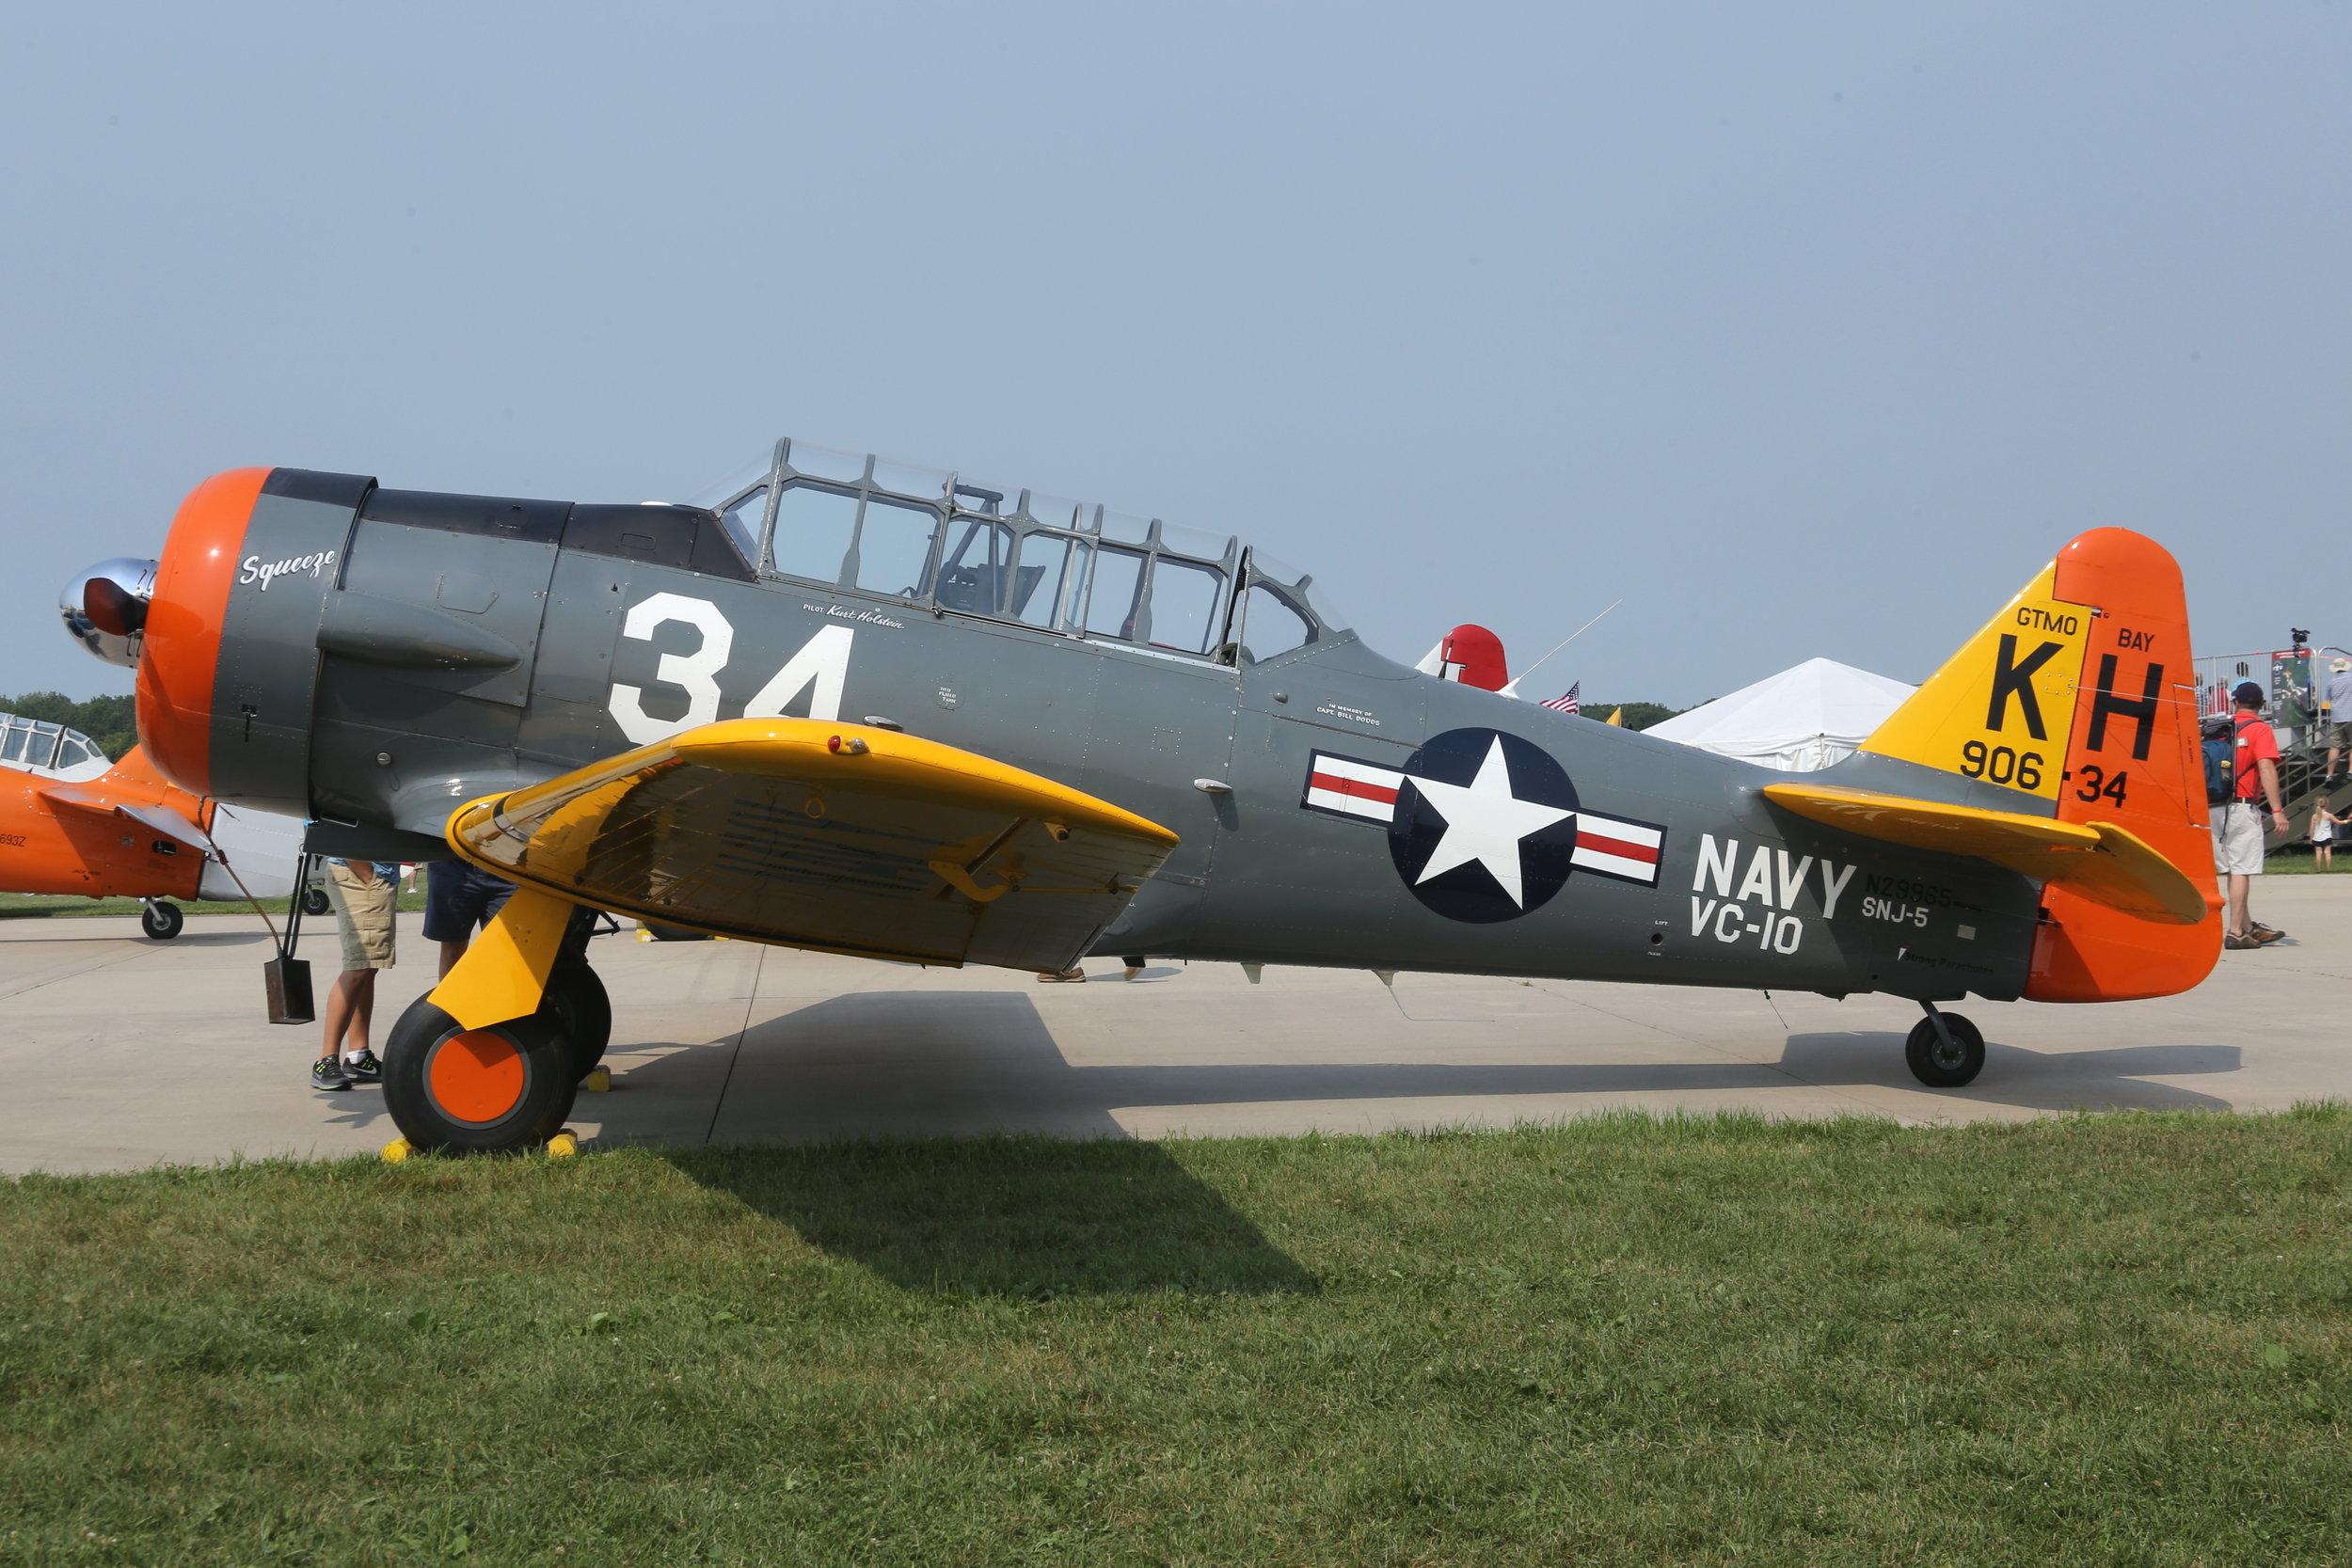 N29965 North American SNJ-5 Texan taken at Oshkosh 23rd July 208 by John Wood